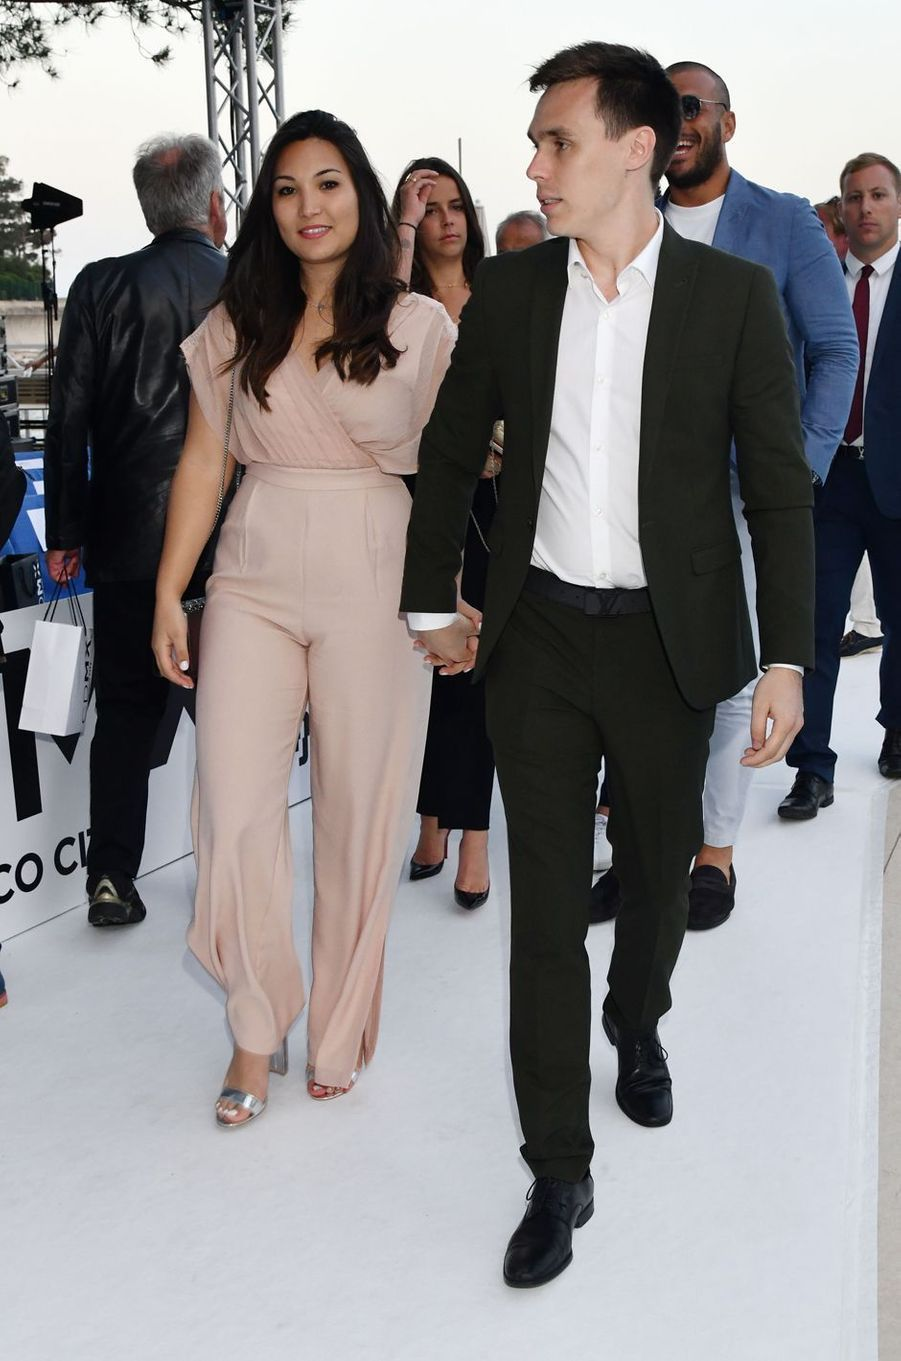 Louis Ducruet avec sa fiancée Marie Chevallier à Monaco, le 25 mai 2018